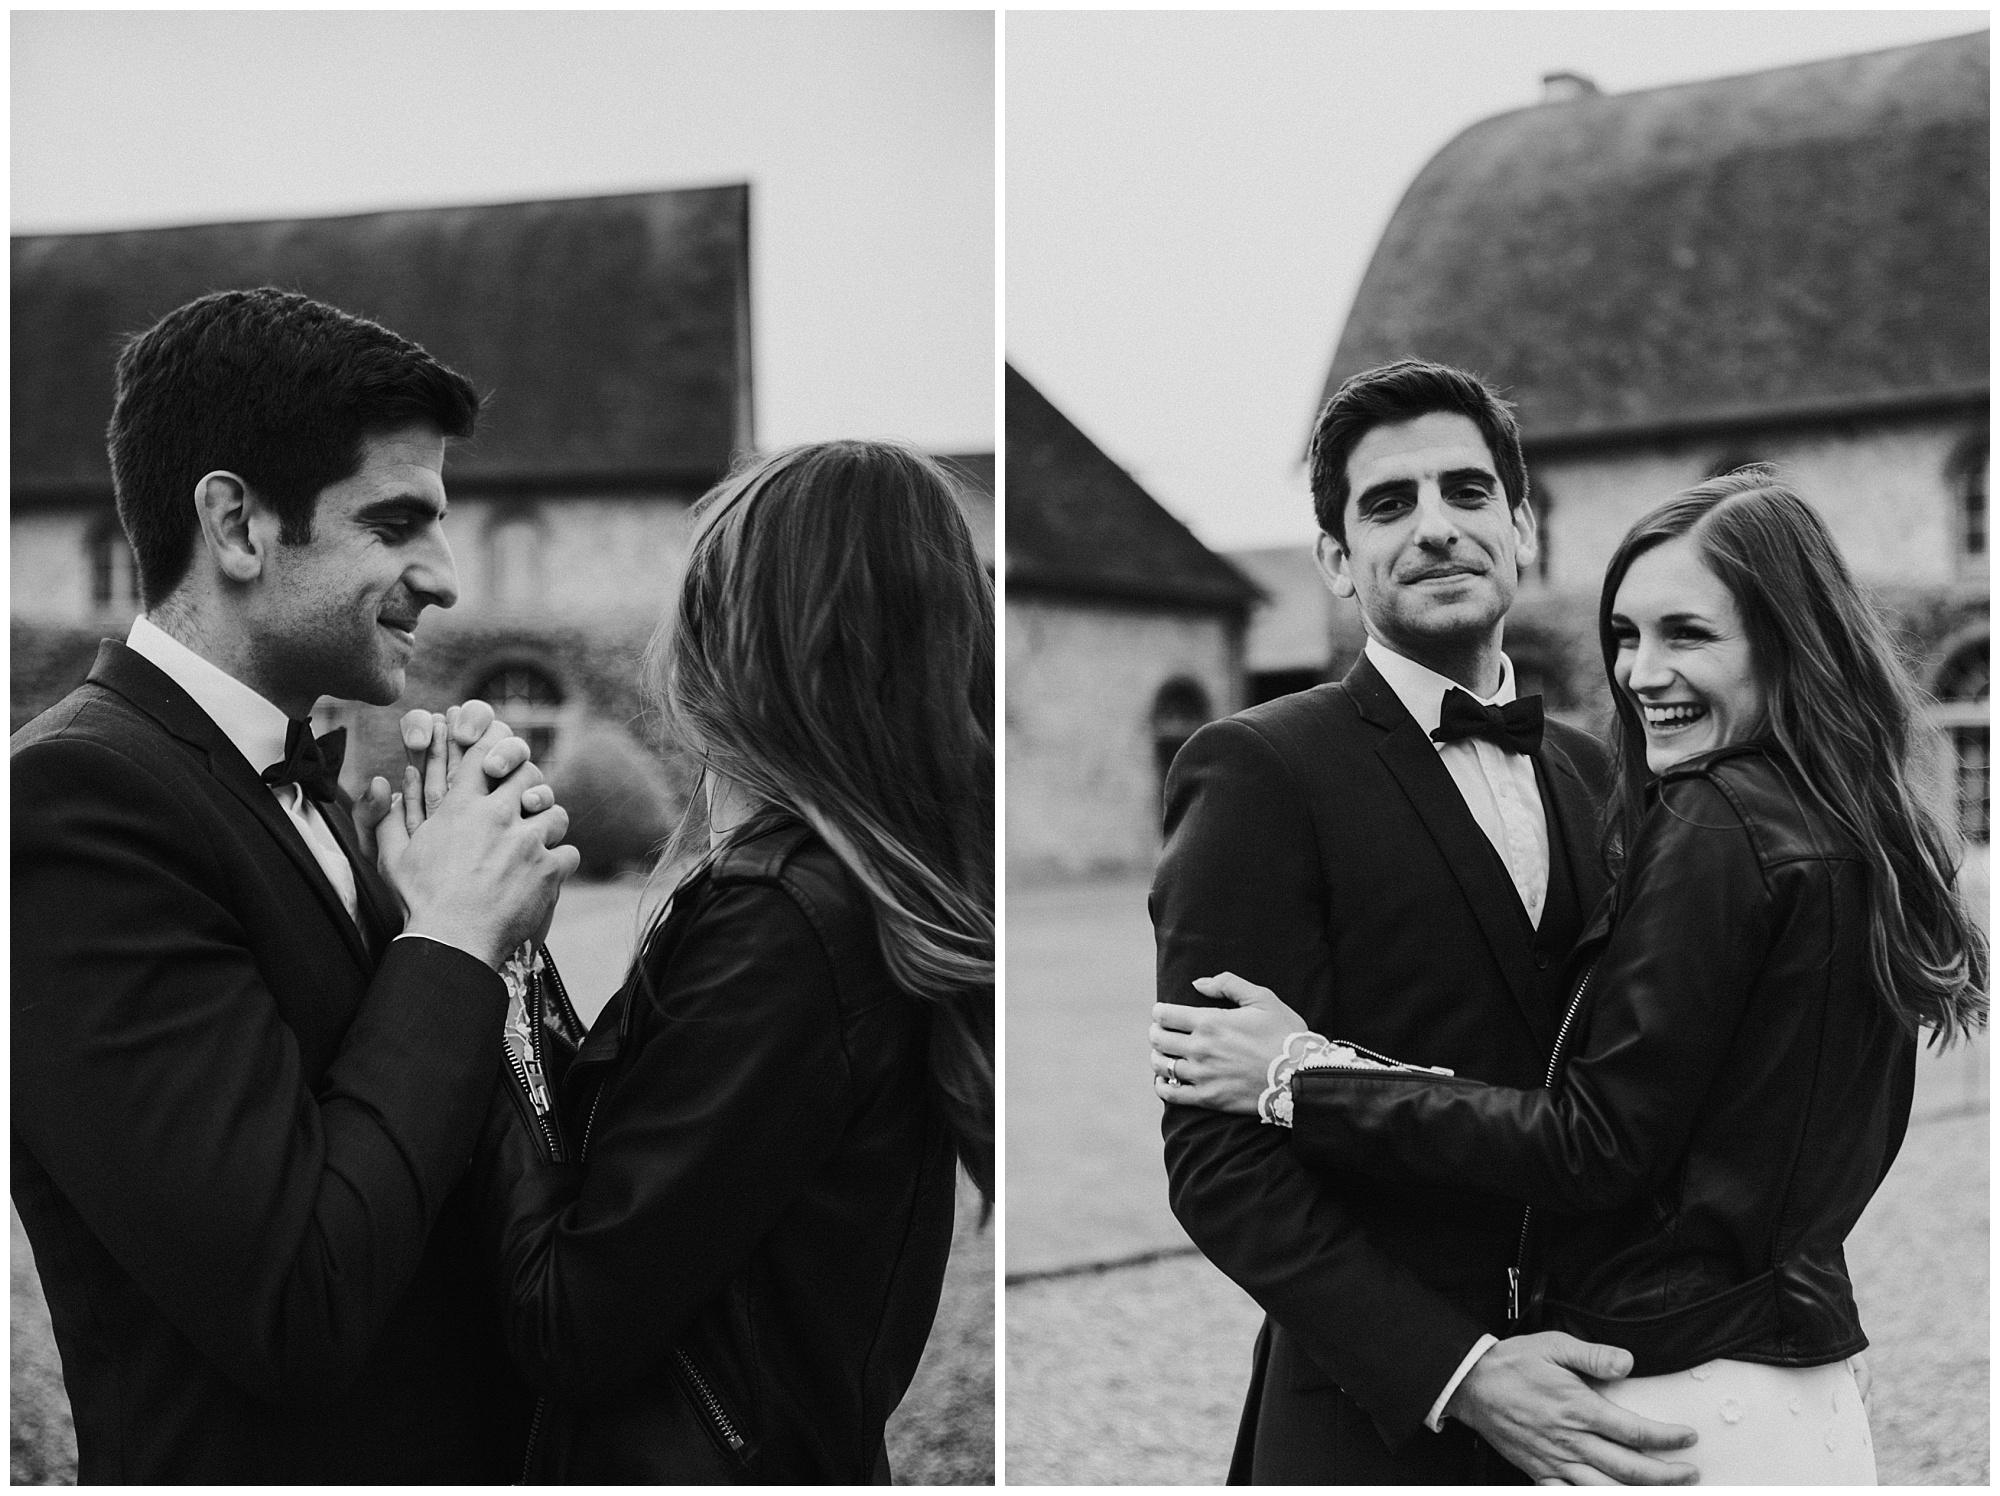 Kateryna-photos-photographer-reims-domaine-des-evis-mariage-normandie-rime-arodaky_0276.jpg